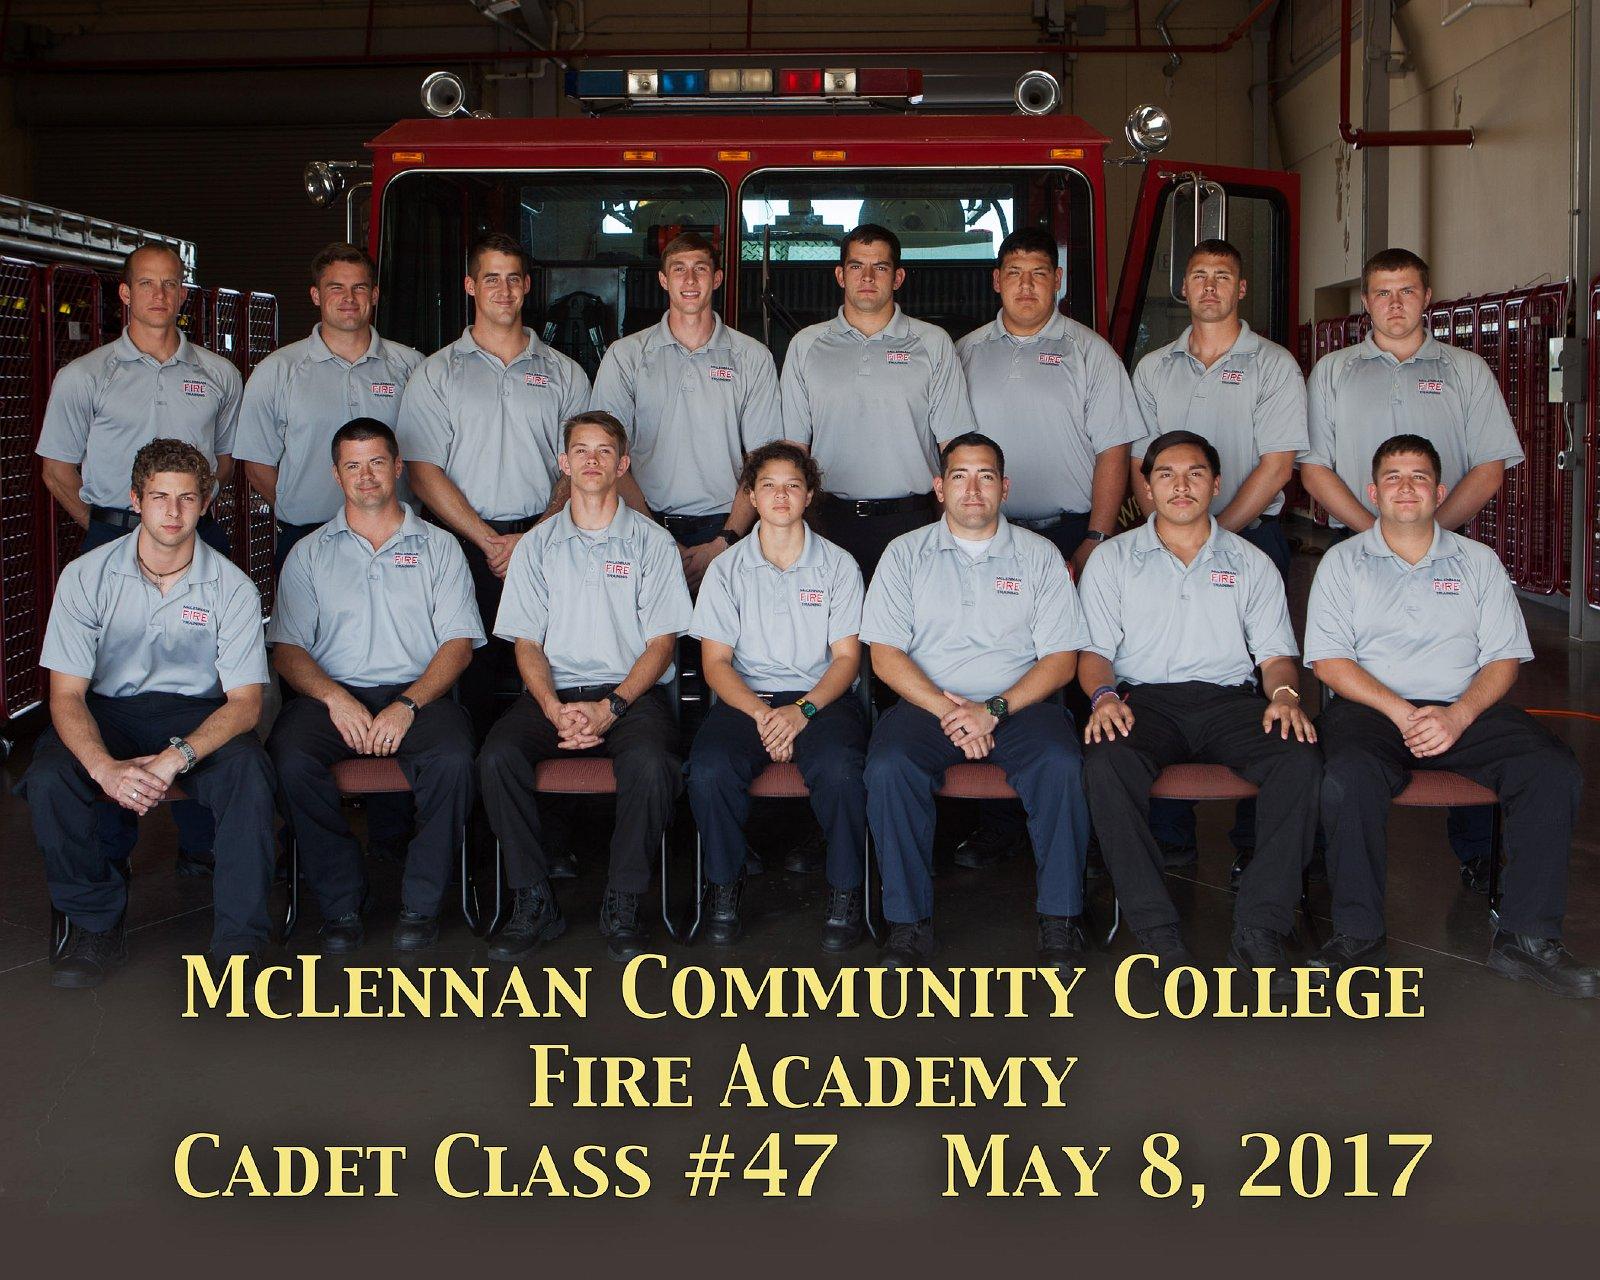 mcc college deepwoods 2017 - photo #38